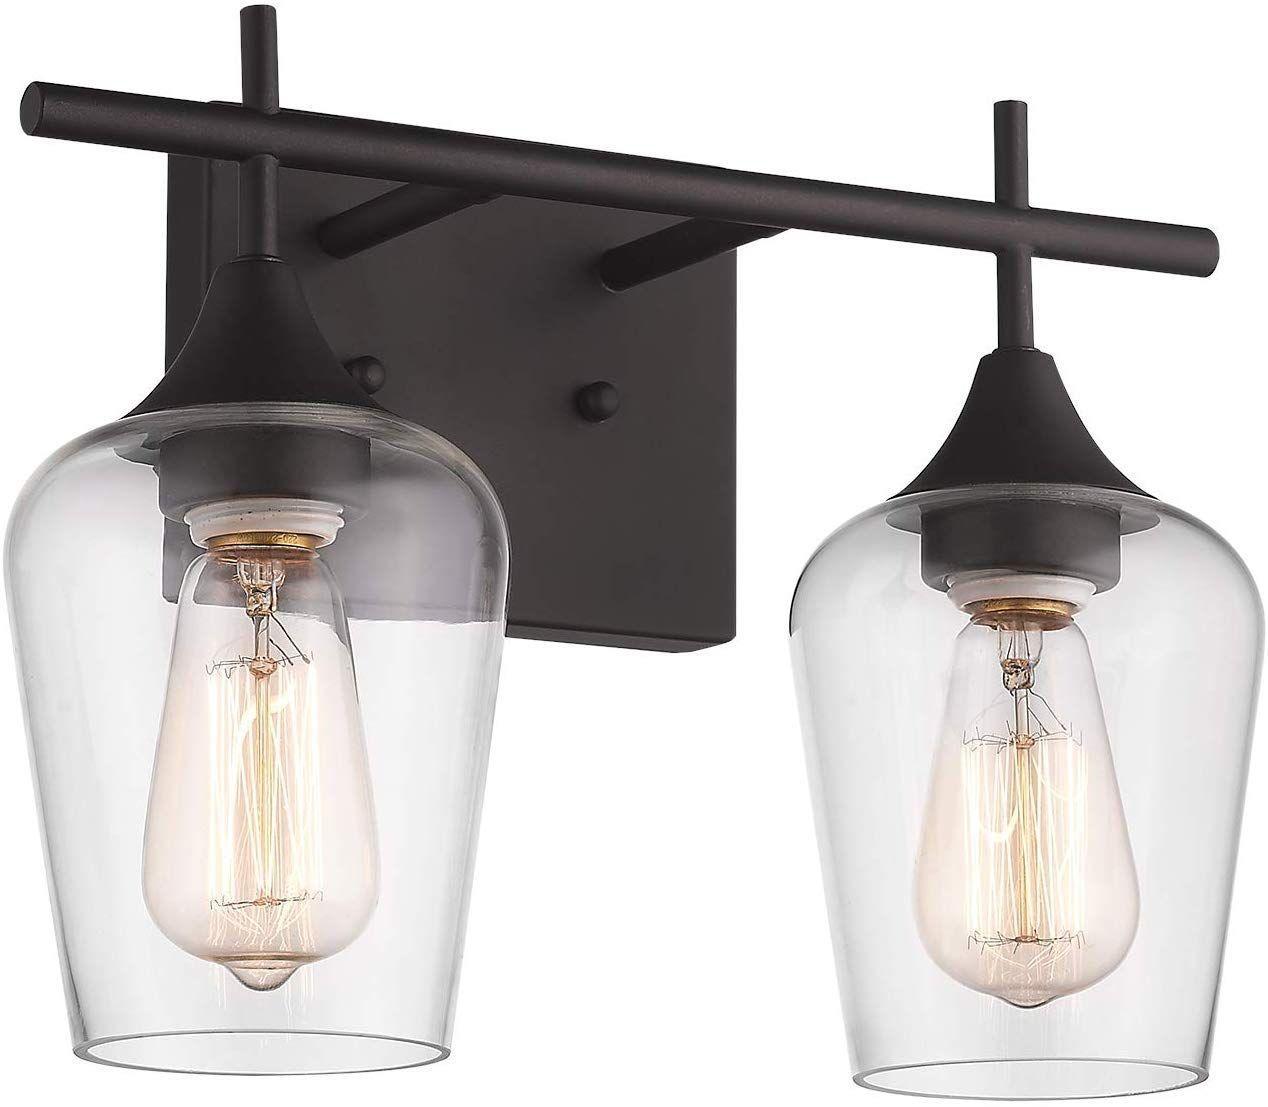 Osimir 2 Light Bathroom Vanity Light Fixtures Vintage Indoor Wall Lamp Lantern 2lig In 2020 Light Fixtures Bathroom Vanity Vanity Light Fixtures Bathroom Lighting